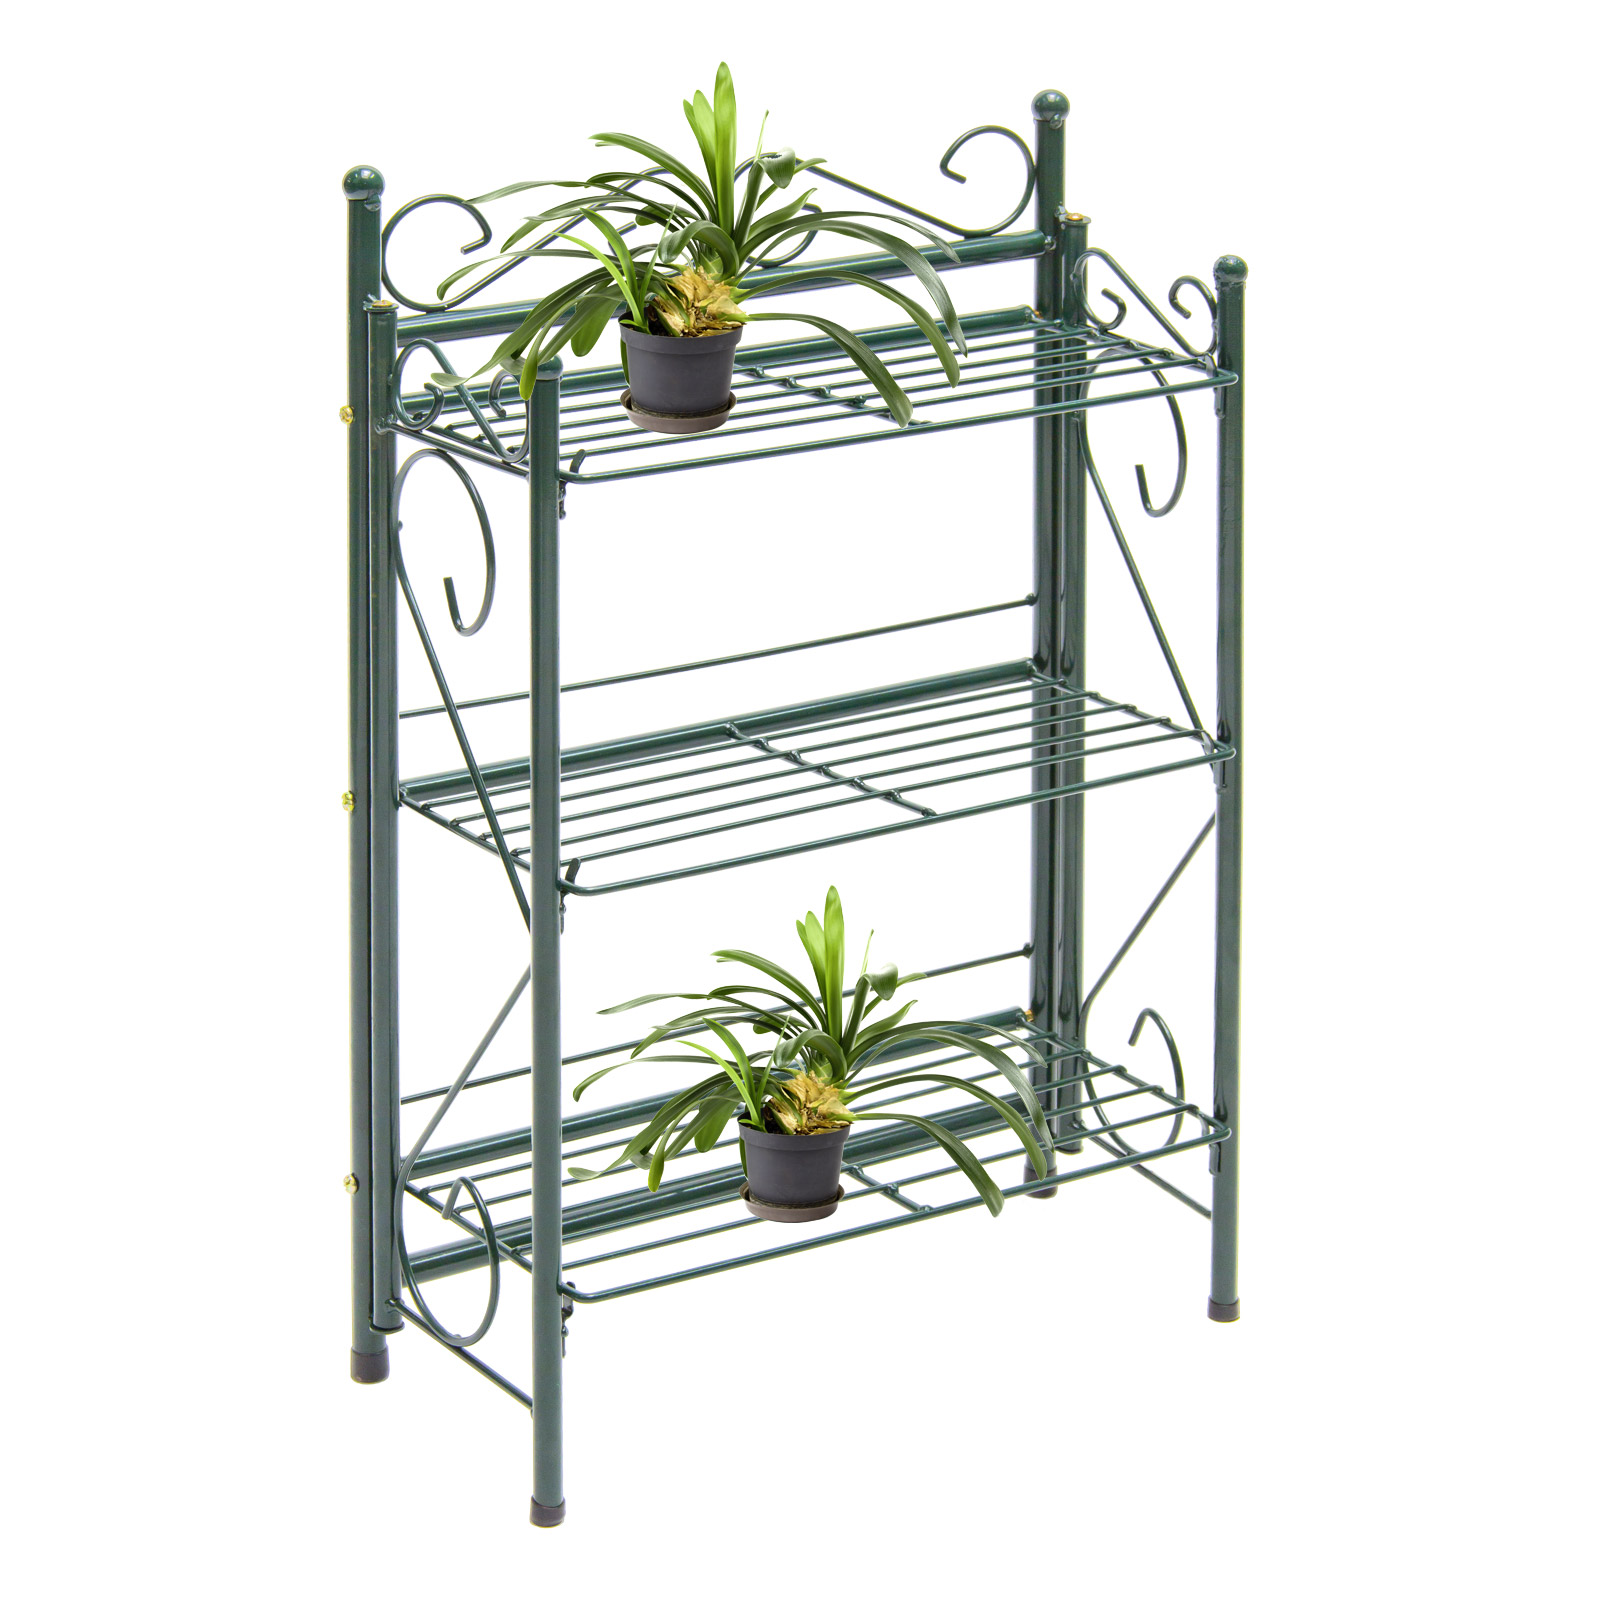 blumenregal metall 918436 regal pflanzenregal. Black Bedroom Furniture Sets. Home Design Ideas